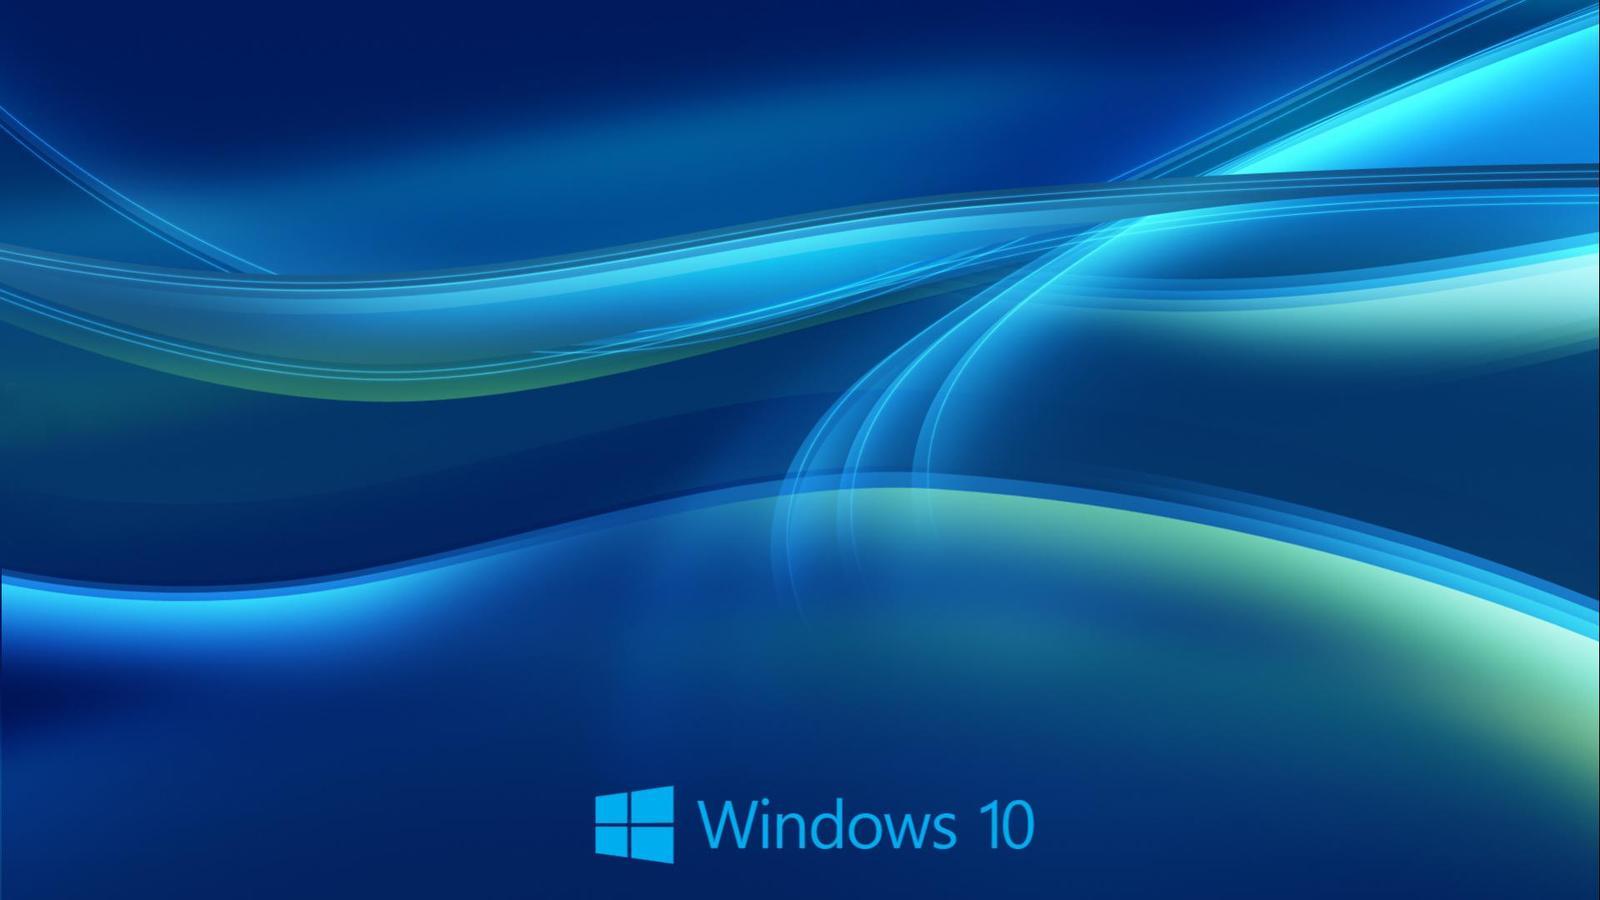 1600x900 windows 10 wallpaper